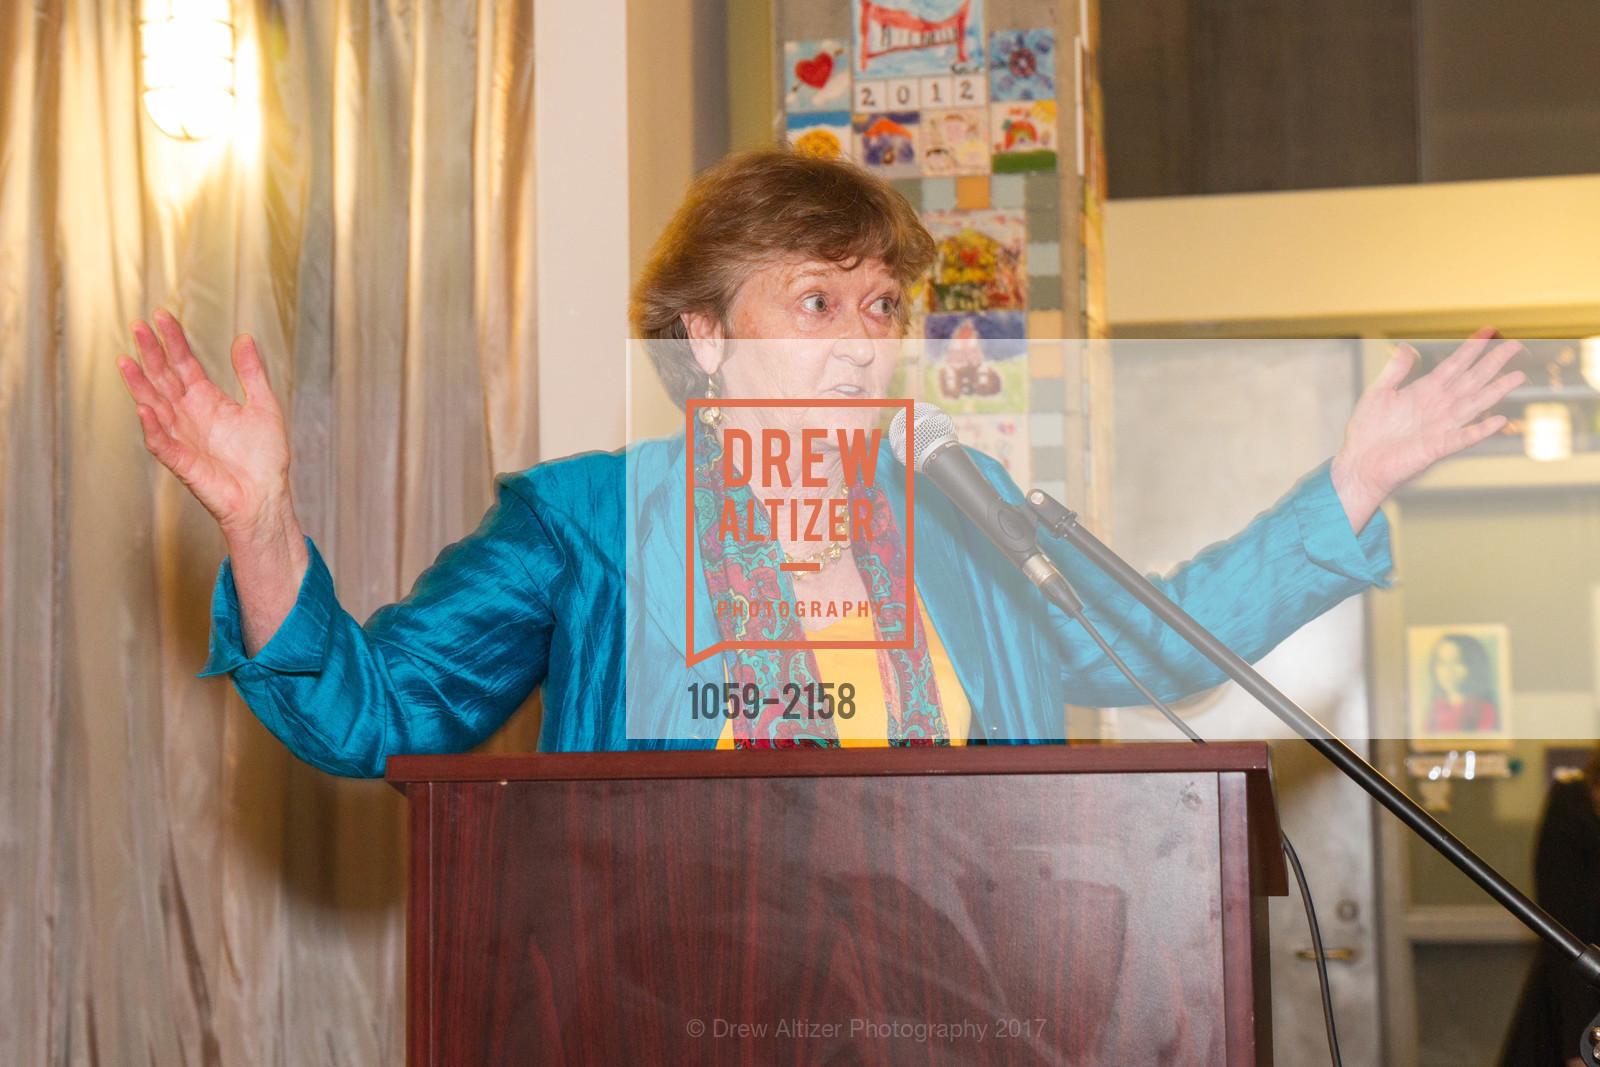 Martha Ryan, Photo #1059-2158